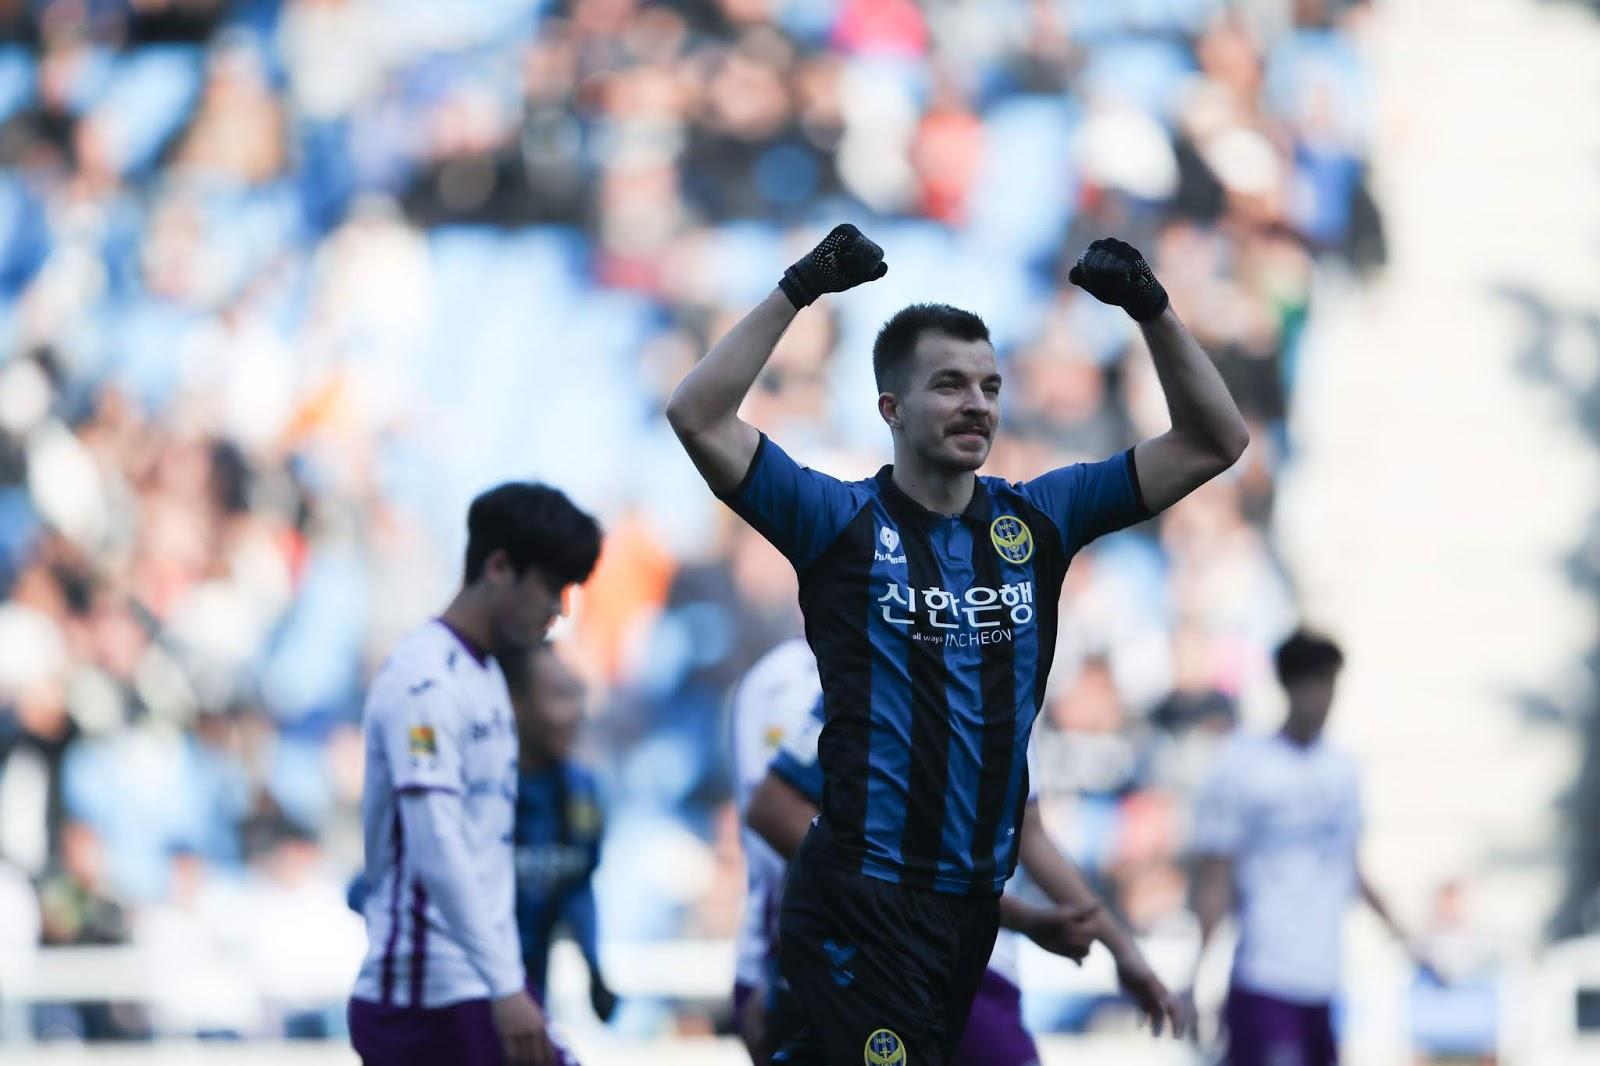 2018 Season Review: Incheon United Stefan Mugosa